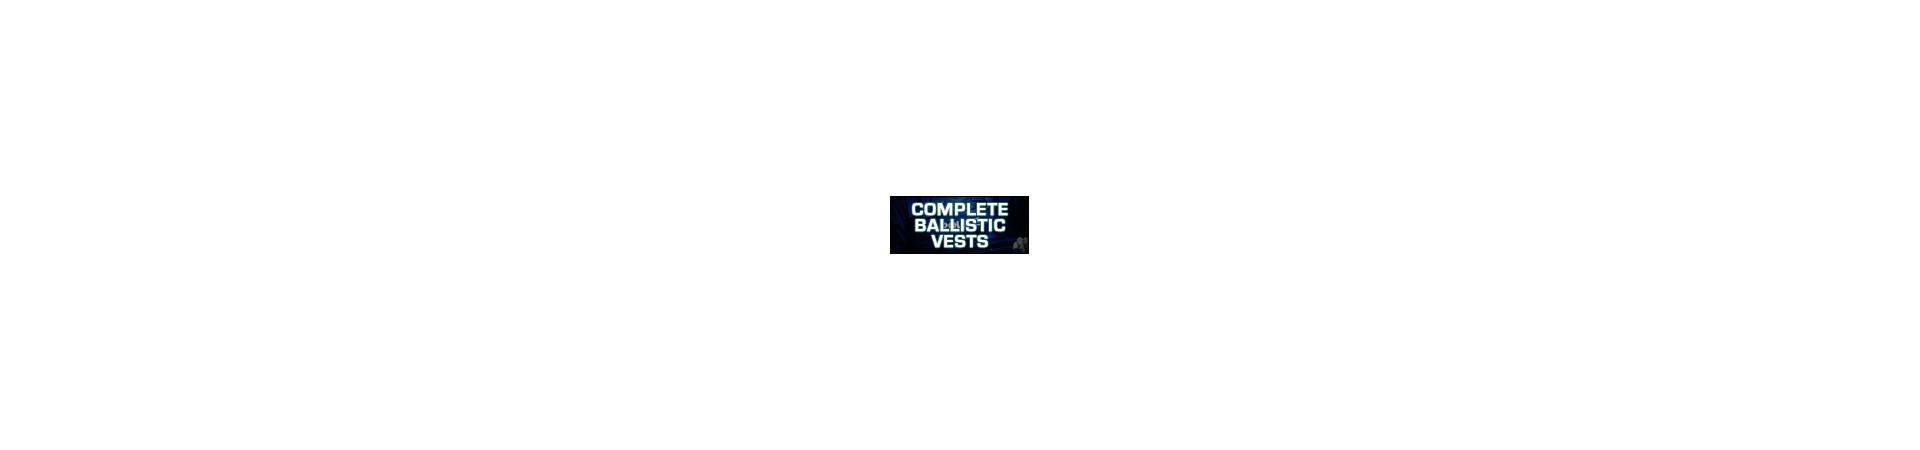 Complete Ballistic Vests